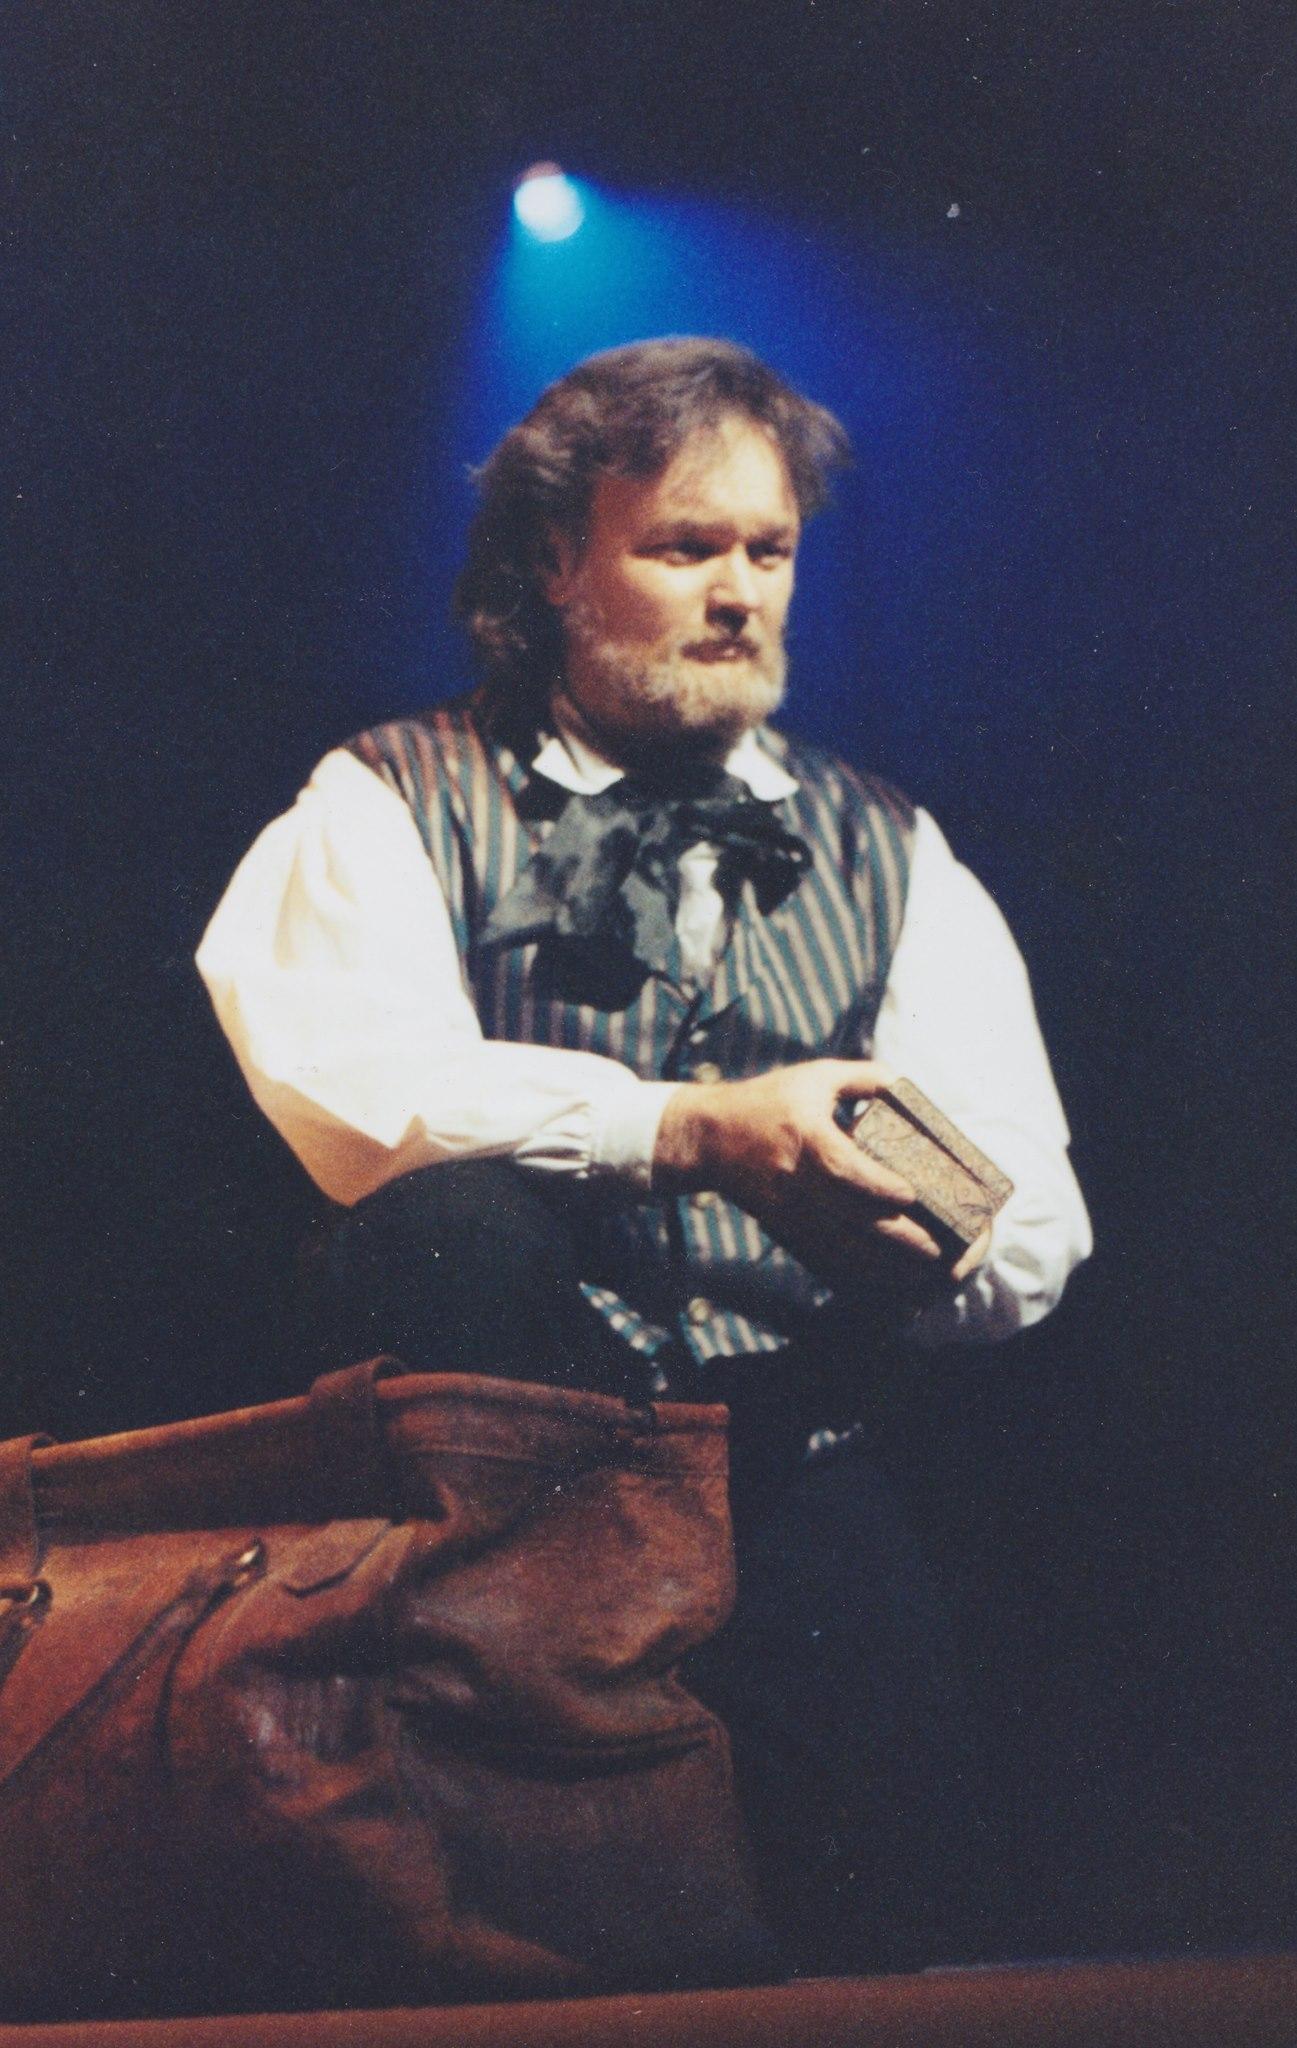 Leigh McRae performing in the the musical Les Misérables, circa 1994.